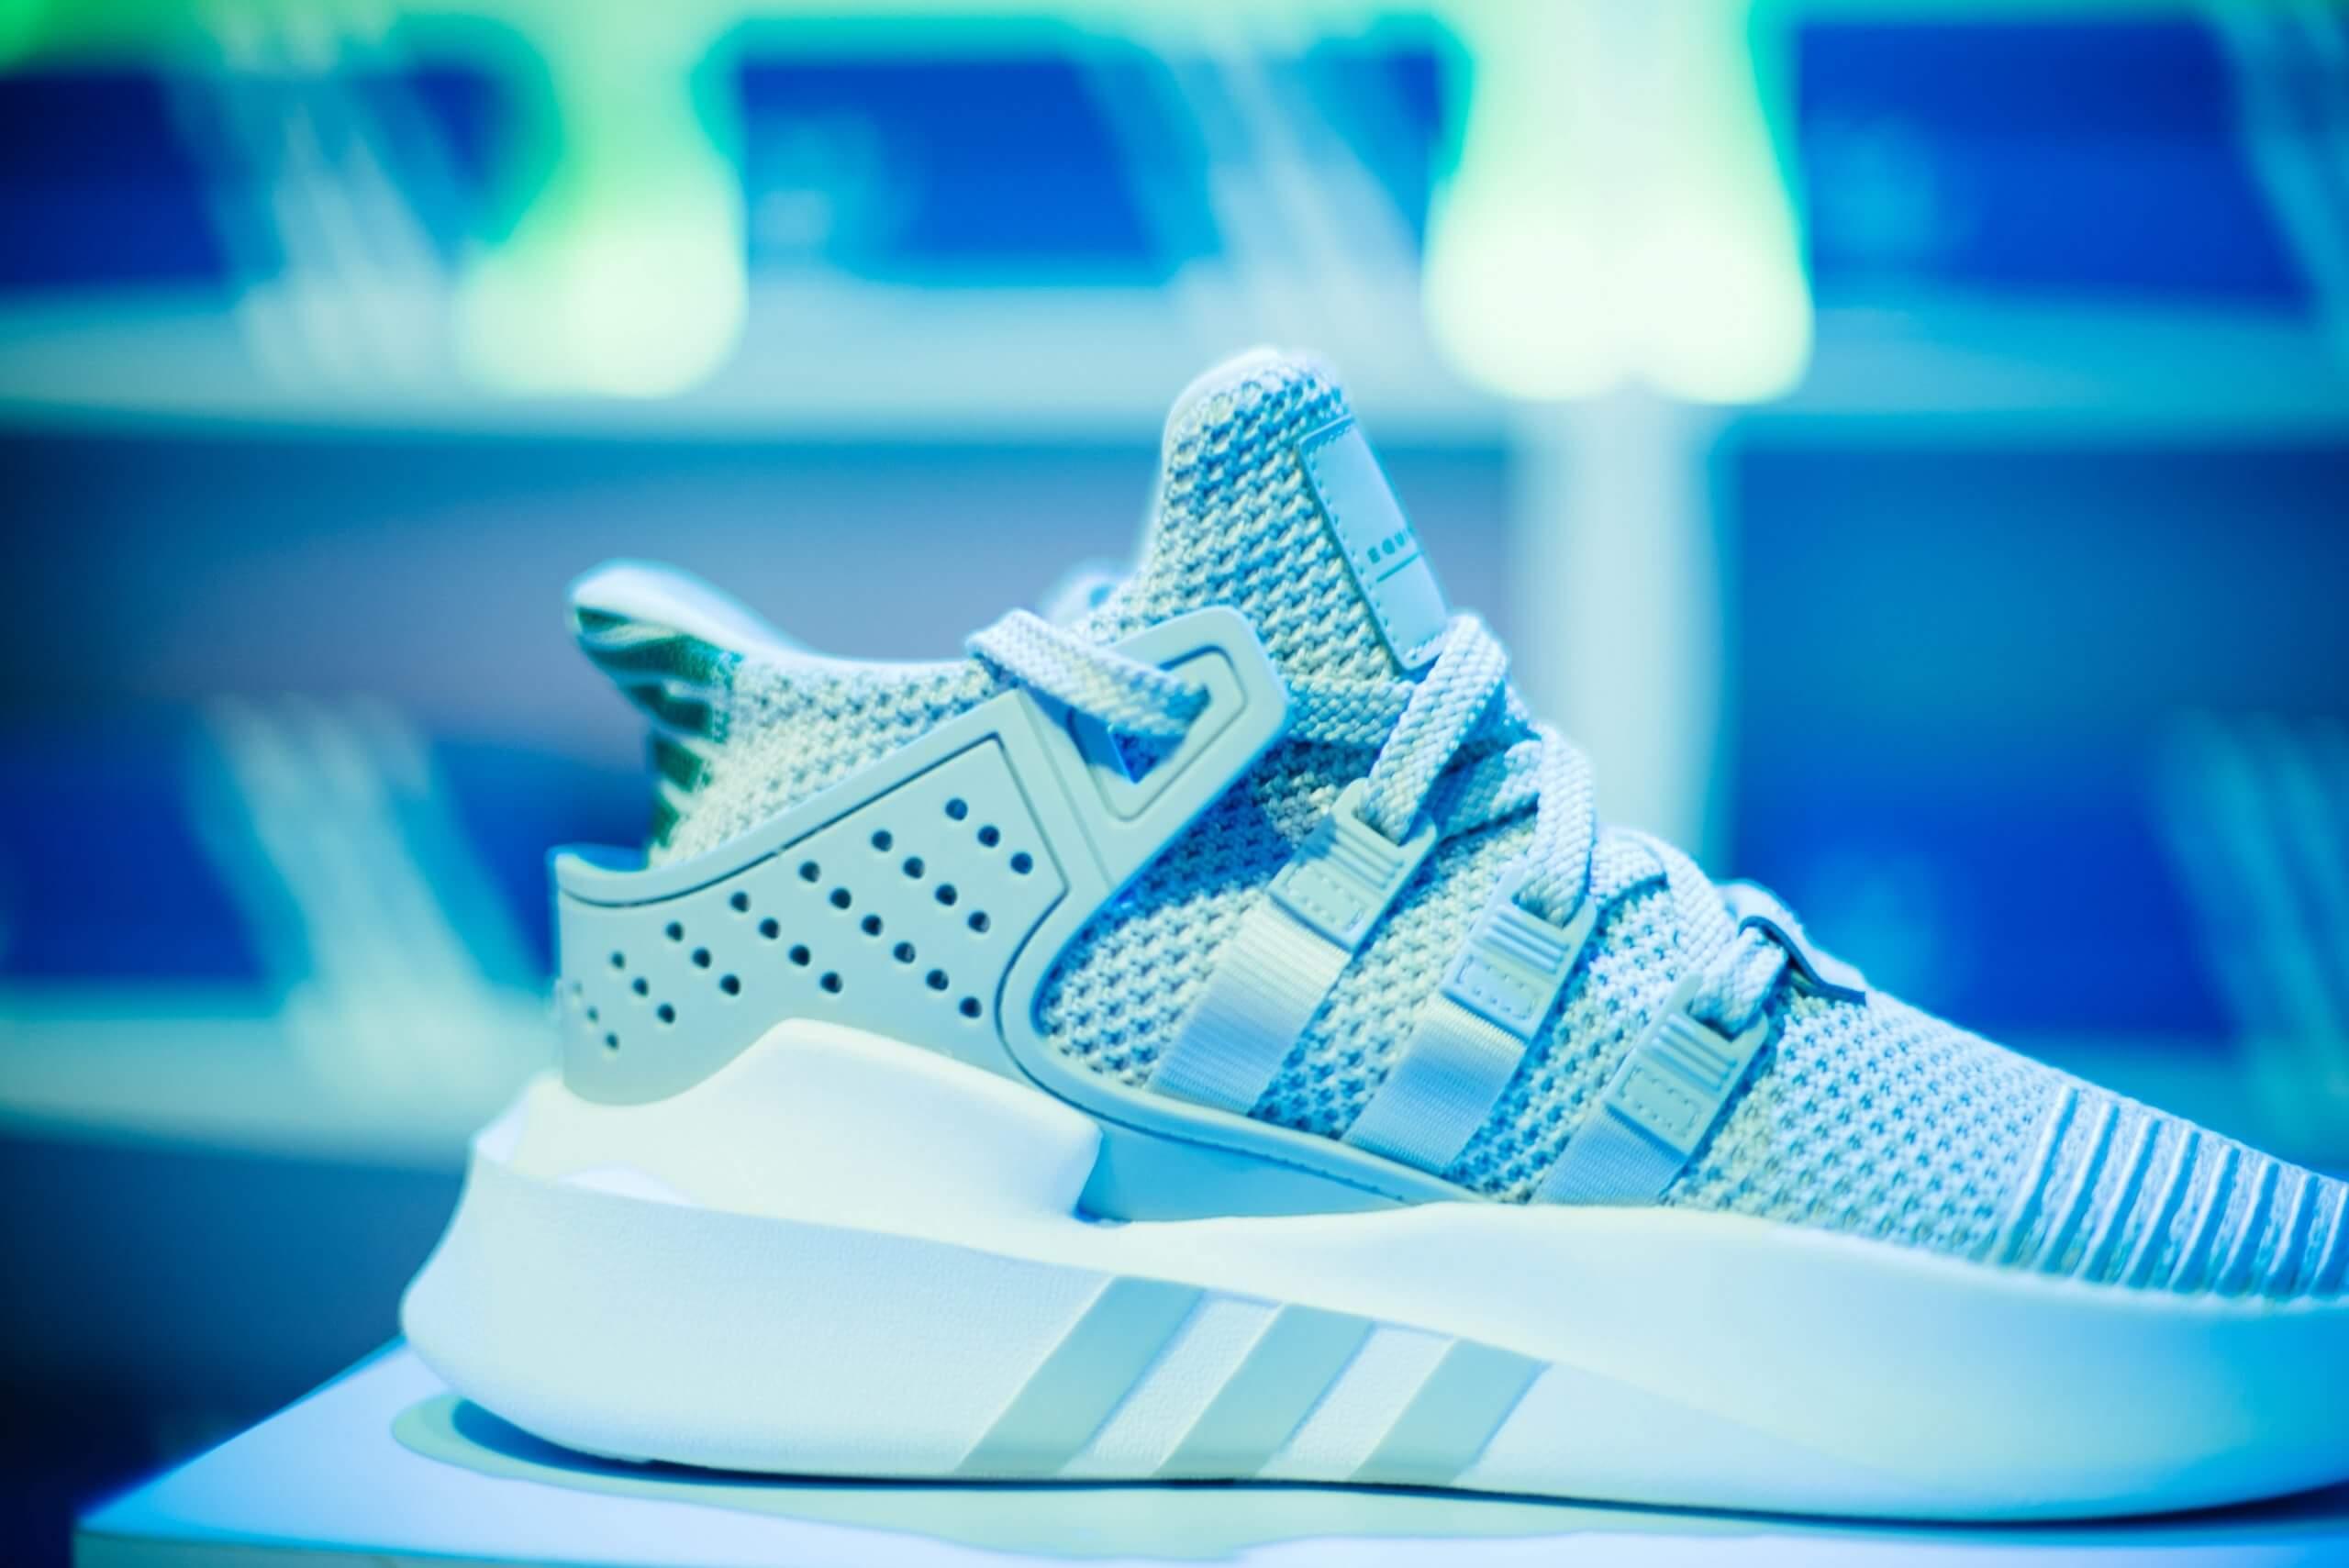 Adidas's Sneaker